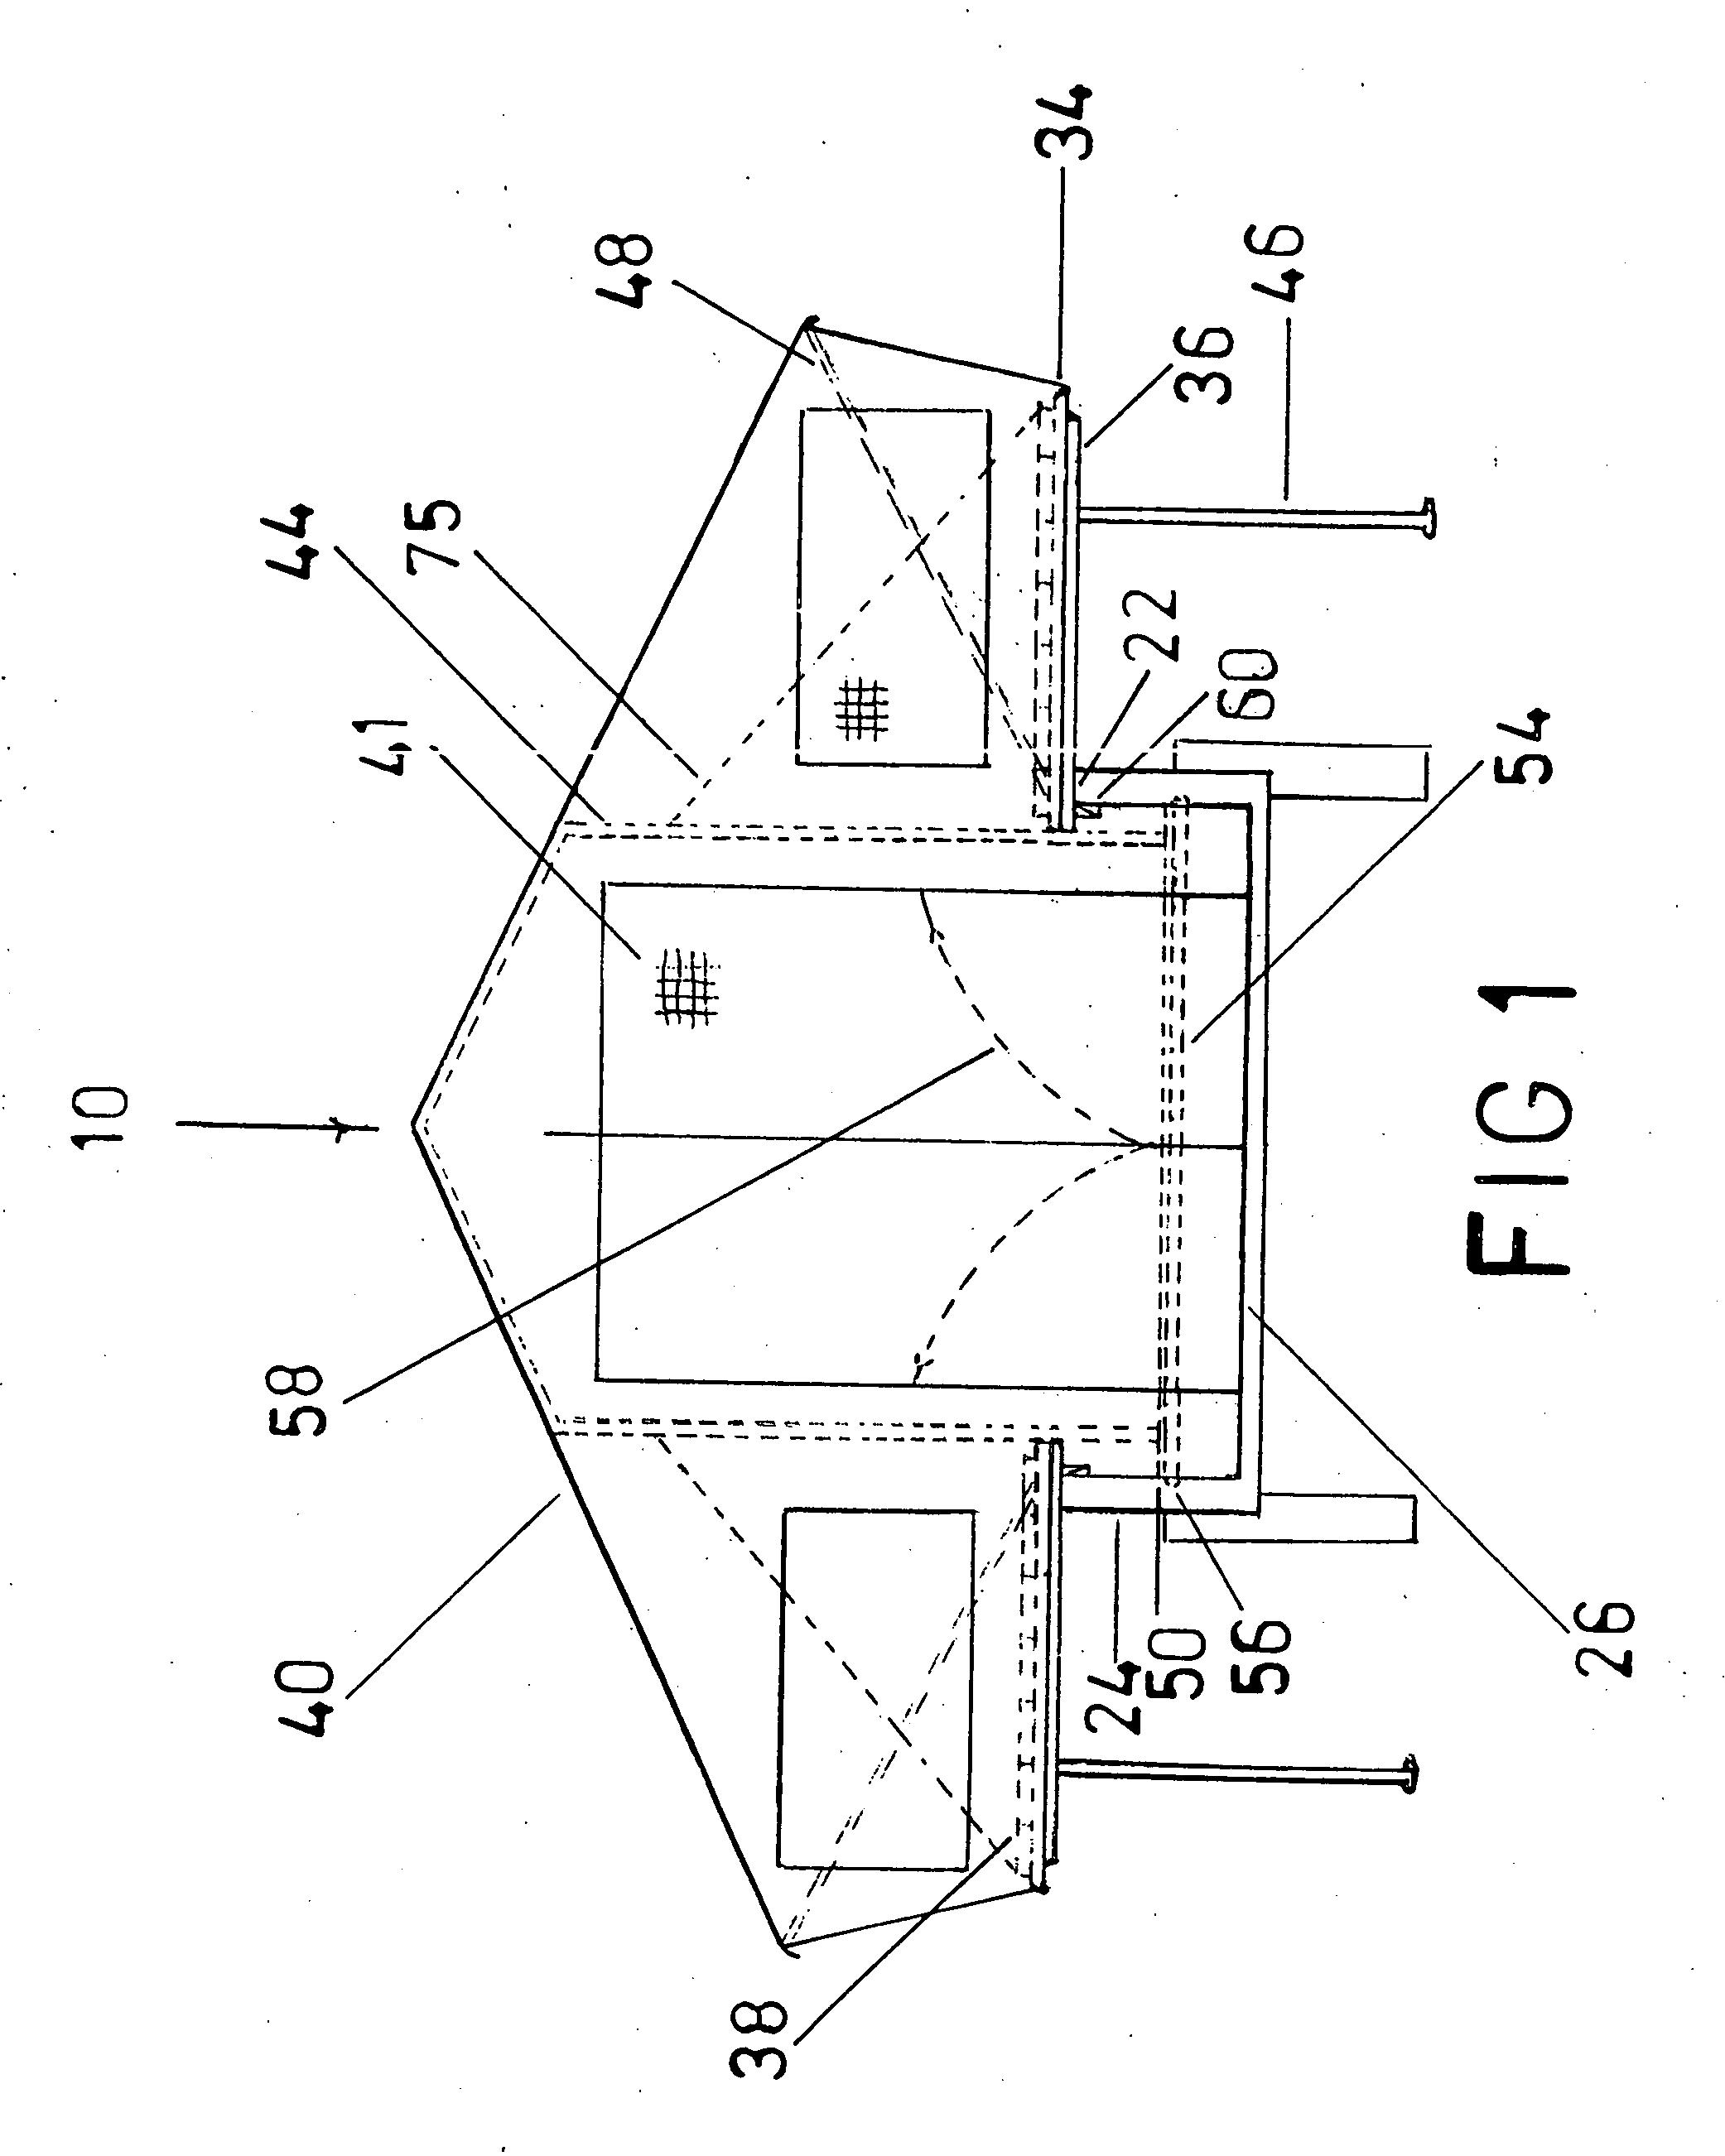 Honda C100 Wiring Diagram Source Sl100 Pop Up C Er Parts On